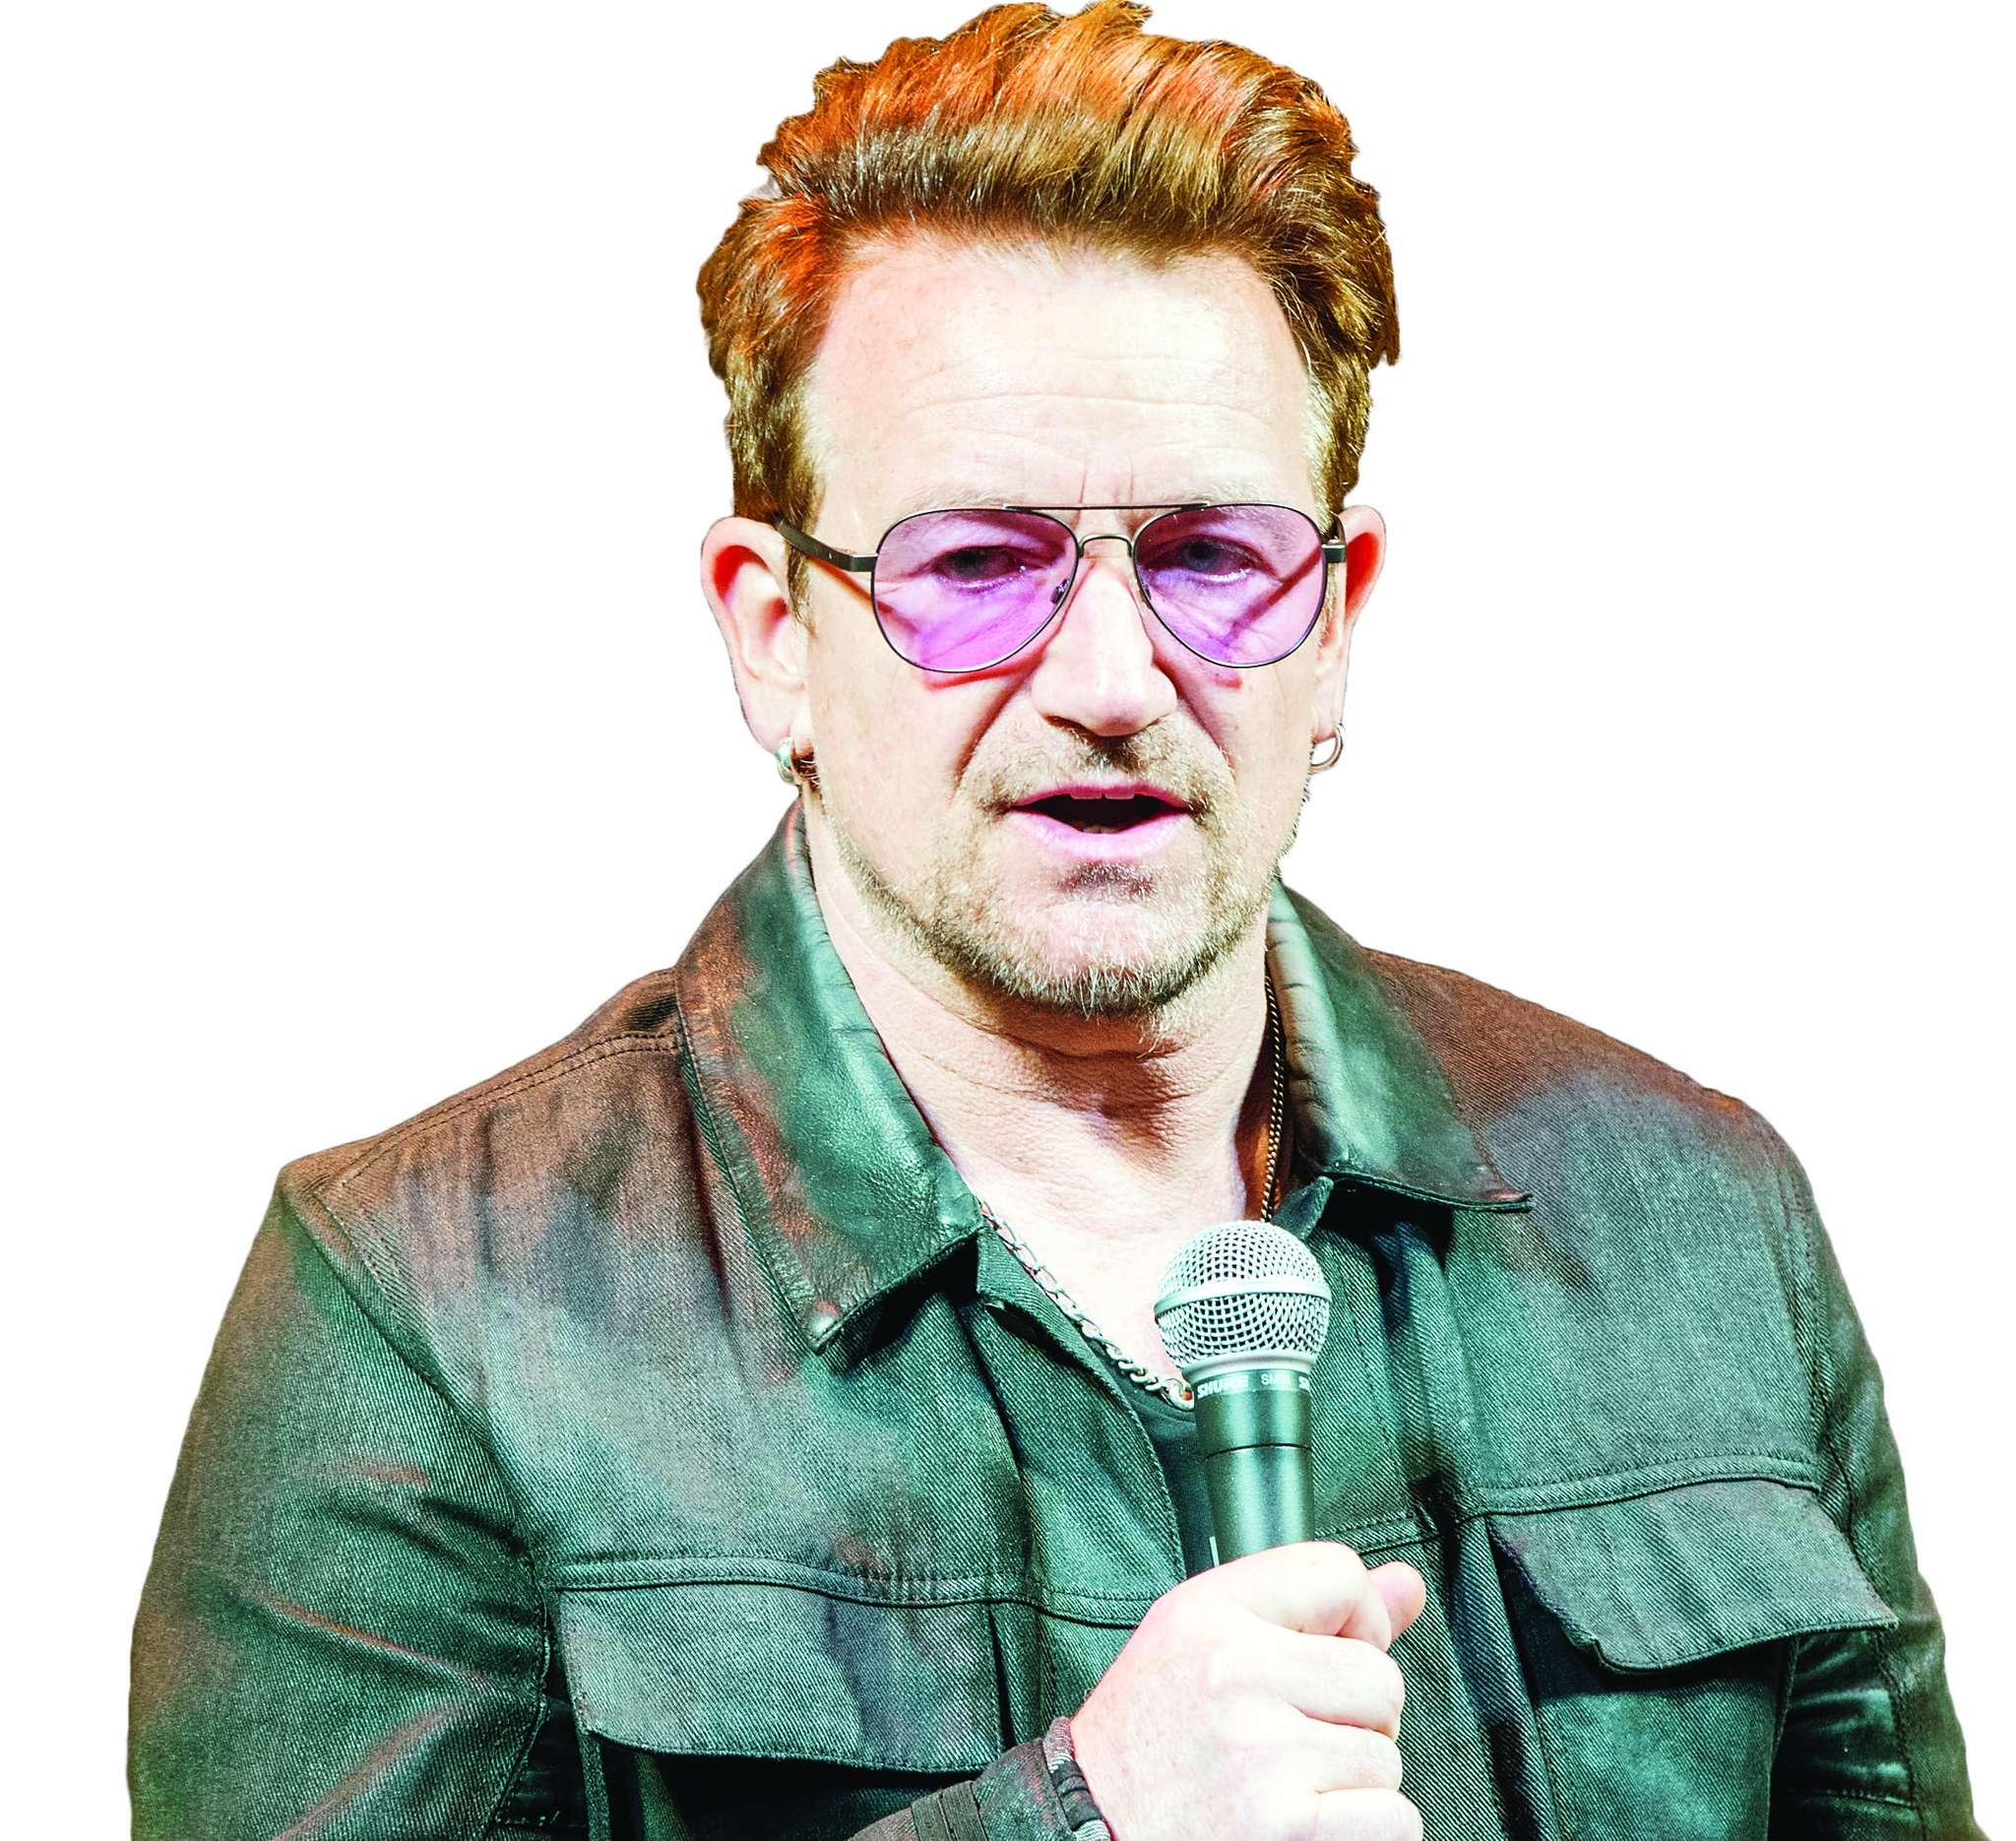 Bono: On women´s list